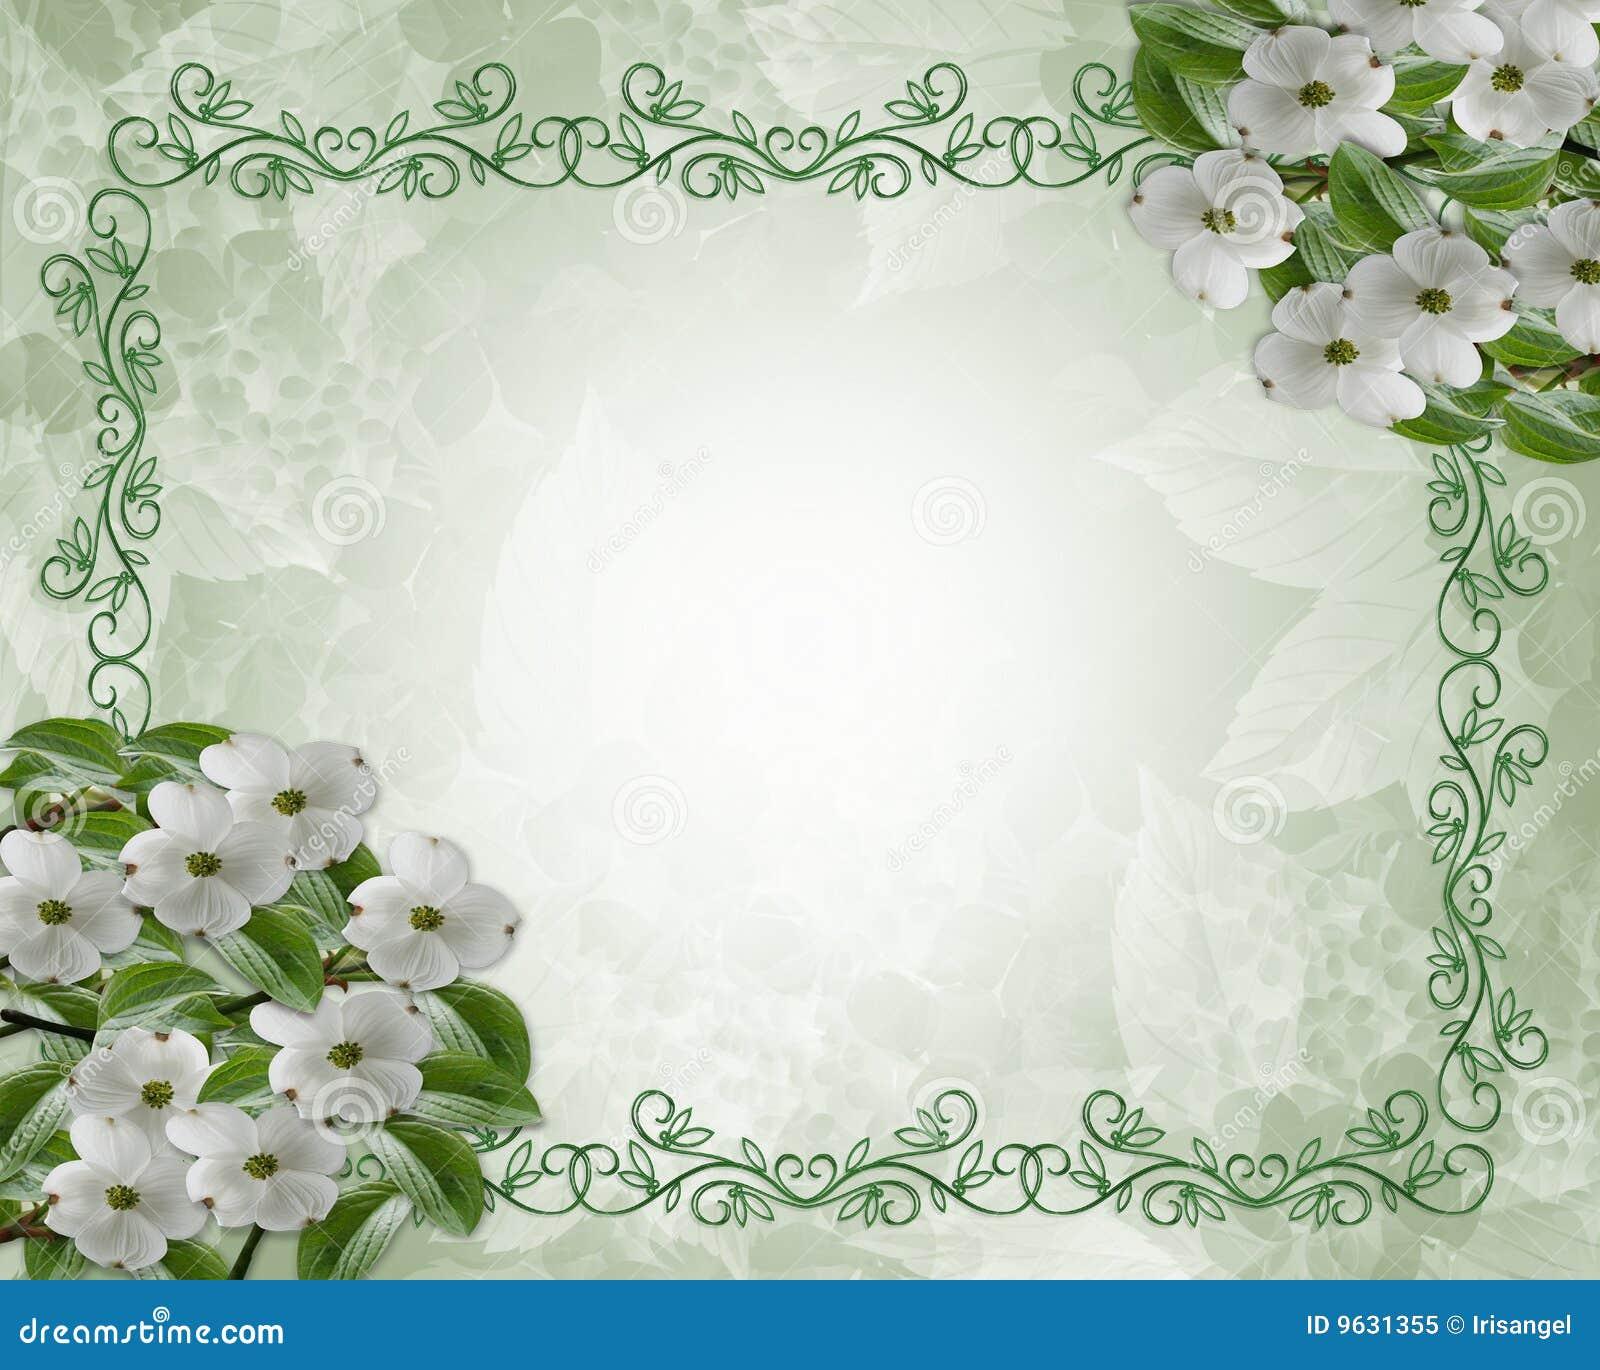 Wedding Flower Borders: Floral Wedding Border Dogwood Royalty Free Stock Photo